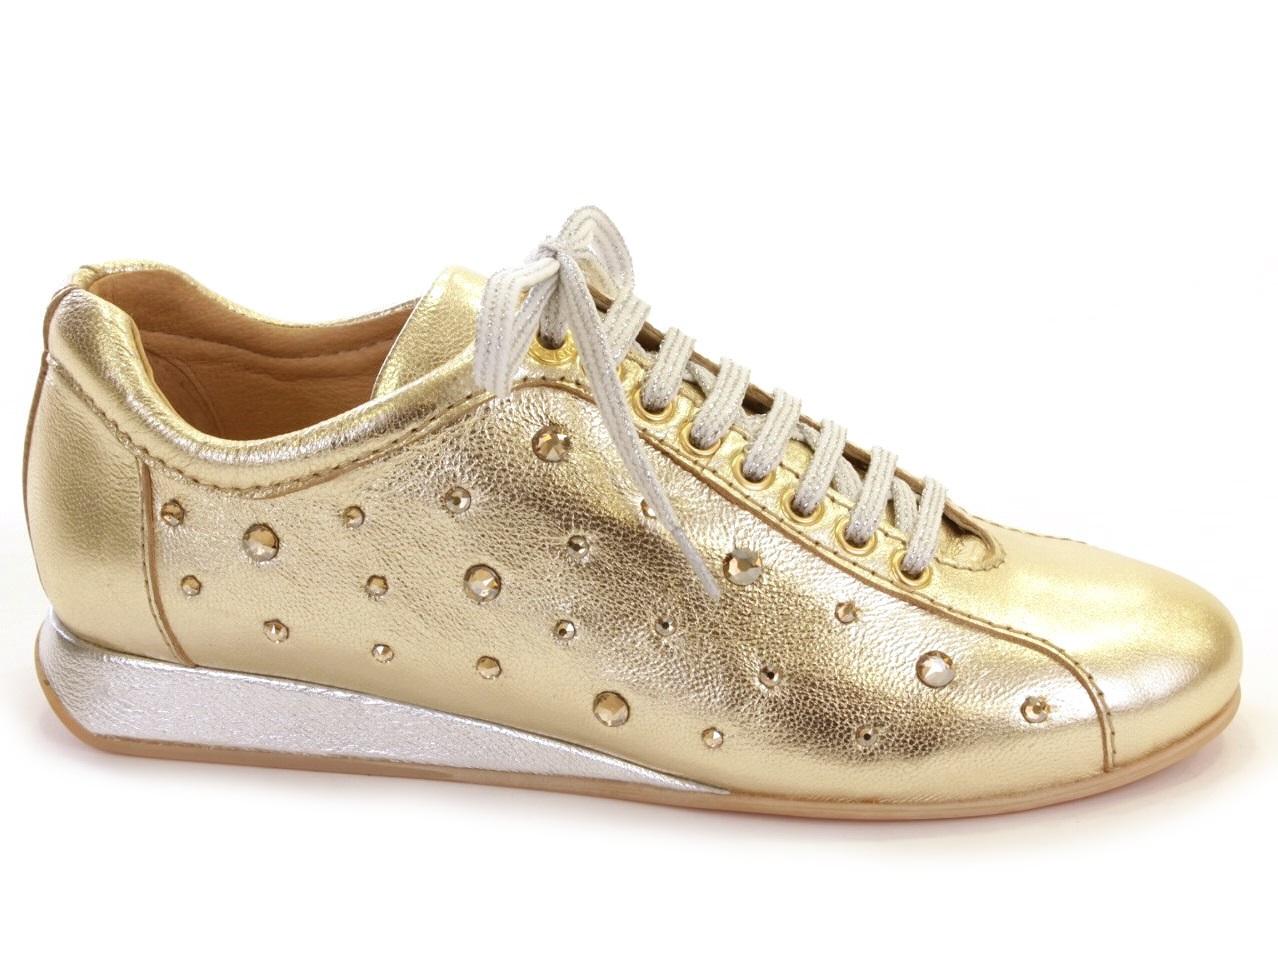 Sneakers and Espadrilles Helsar - 032 2686